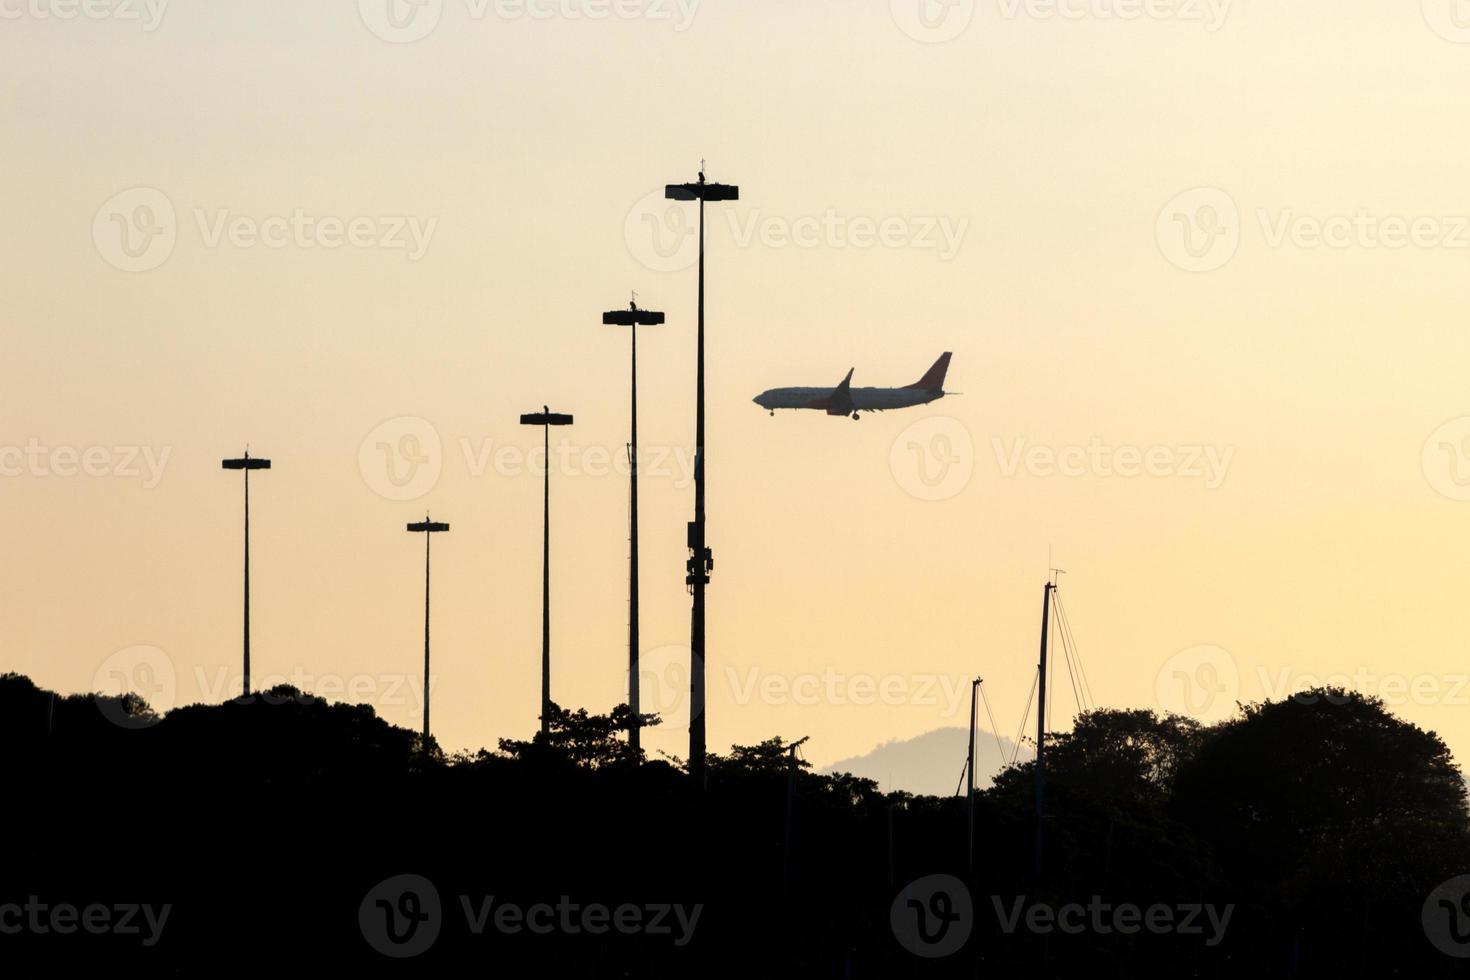 Airplane silhouette on the embankment of the Flamengo, Rio de Janeiro photo